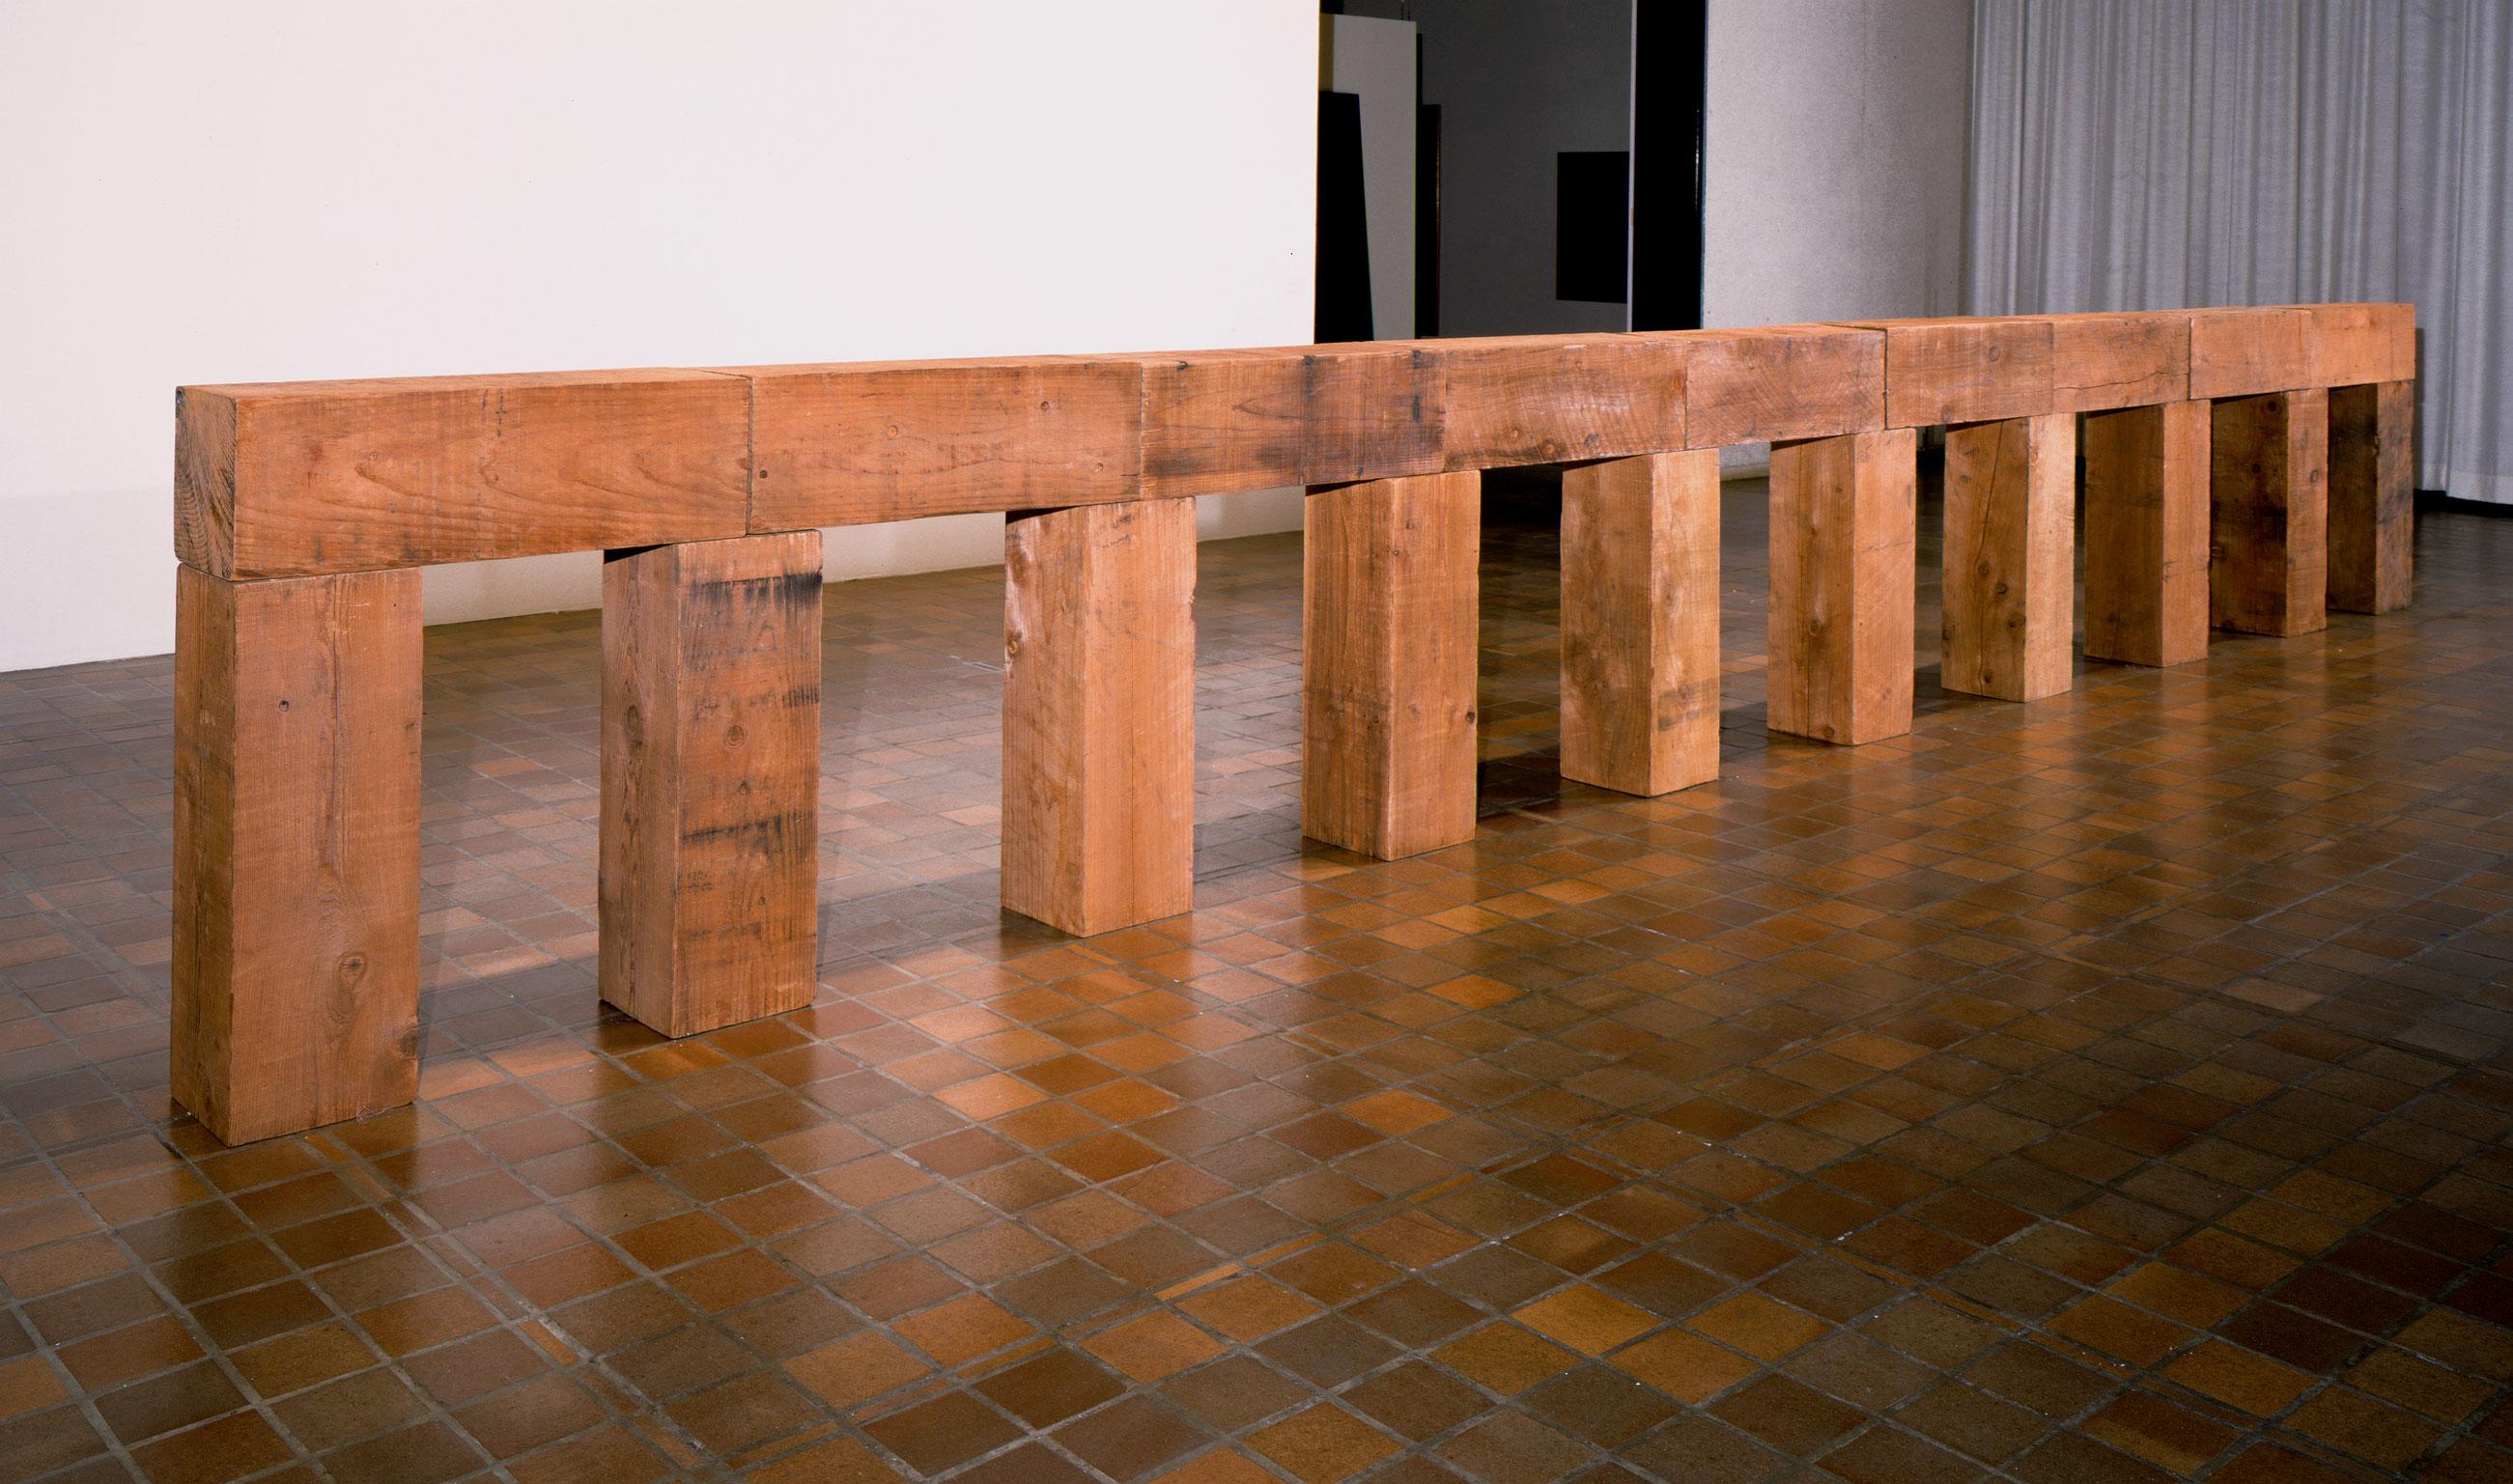 Neubrückwerk Düsseldorf gewidmet, 1976, Carl Andre, Cèdre rouge.